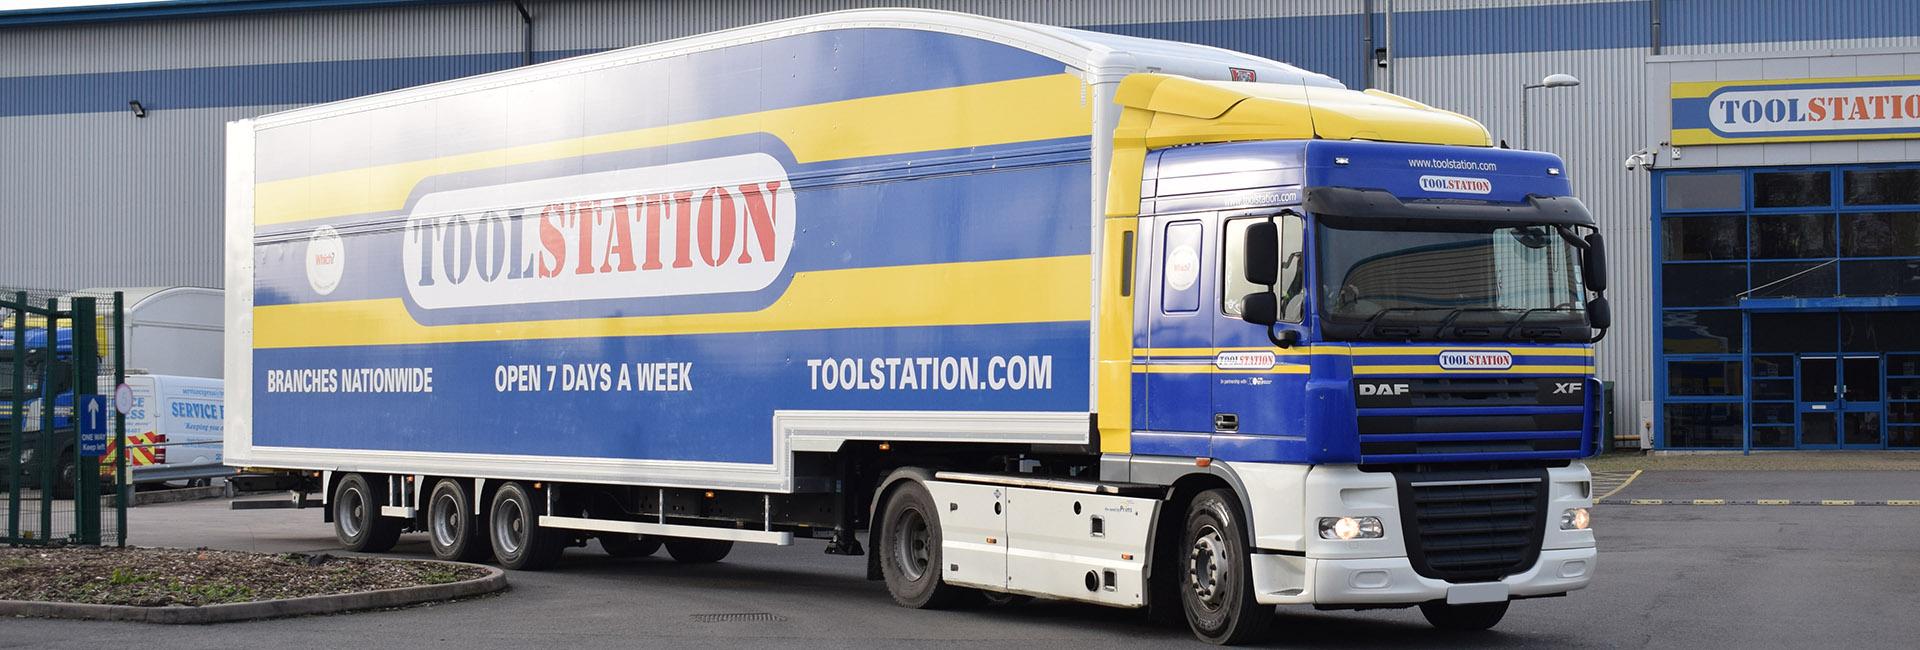 Case study - Howard Tenens 3PL logistics longer semi trailer LST double deck front DAF XF truck